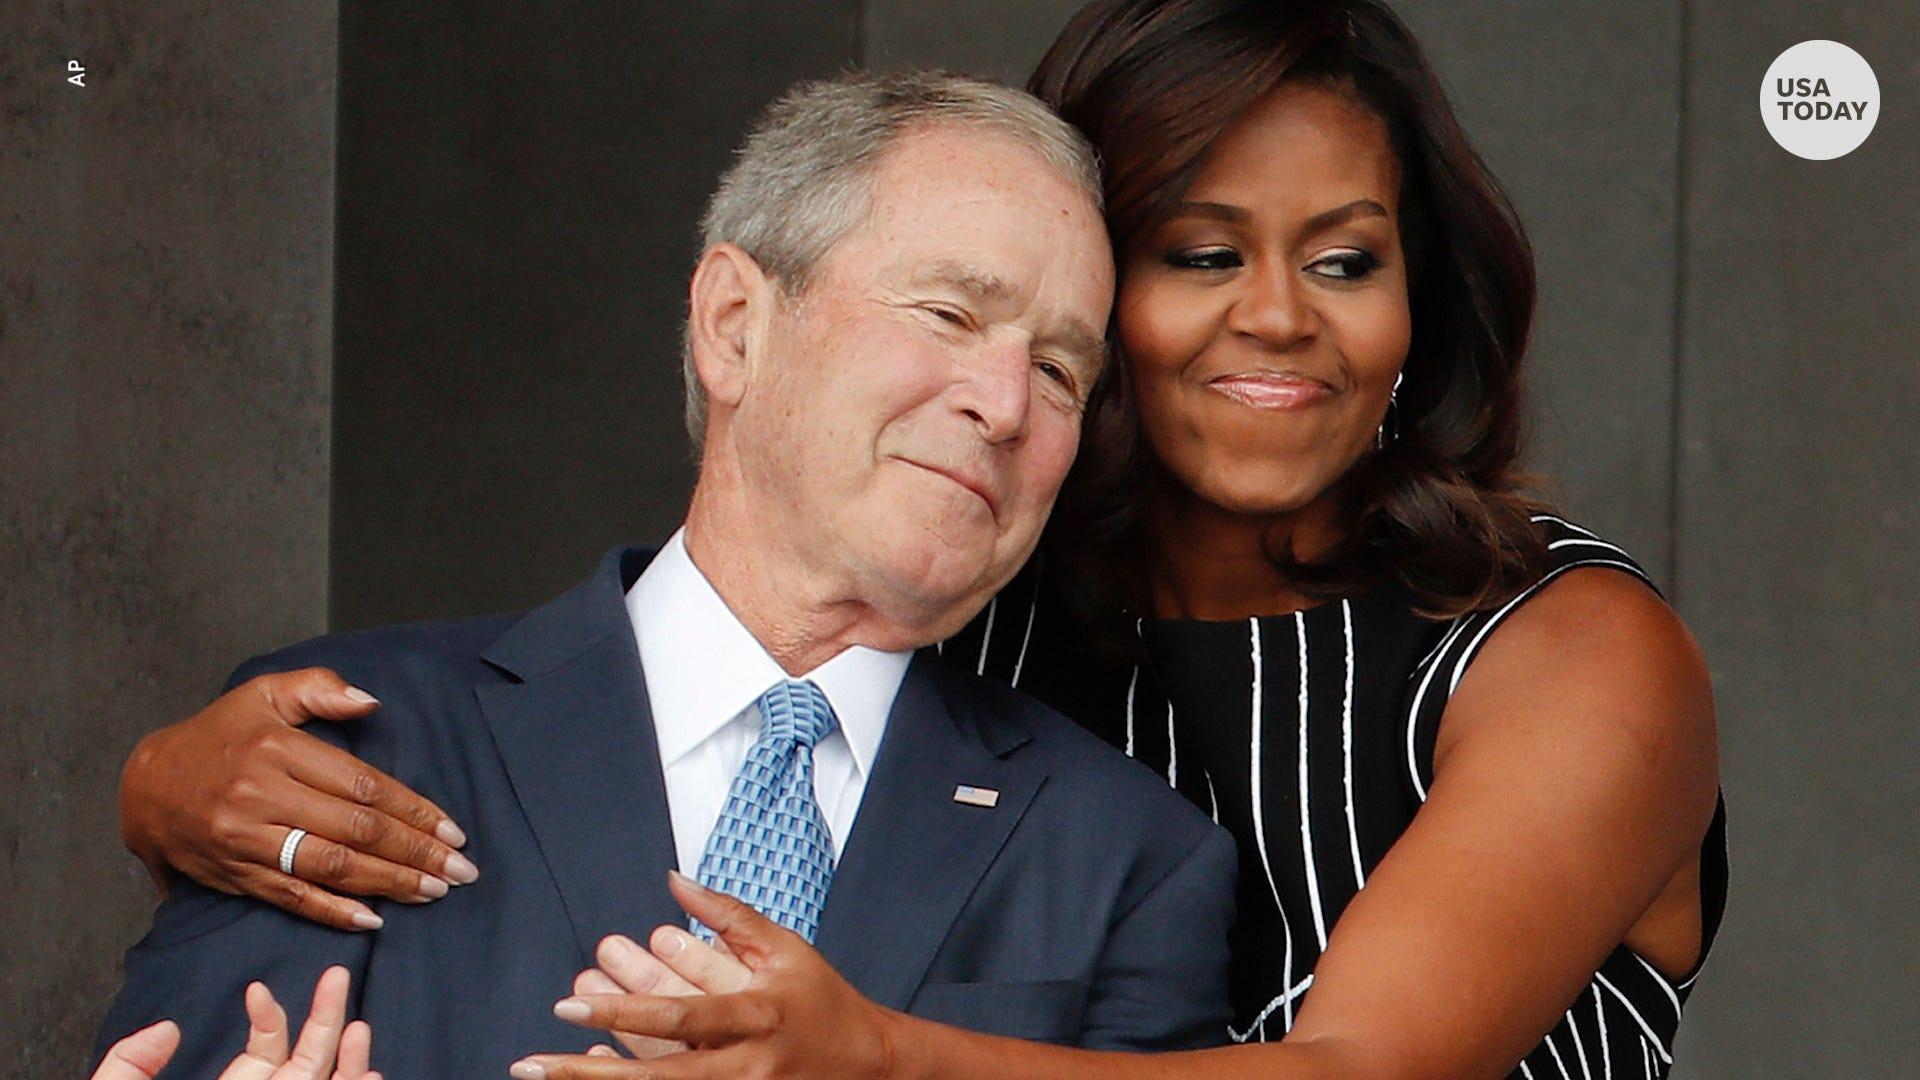 Foto Michelle Obama nudes (83 photos), Ass, Hot, Selfie, swimsuit 2006